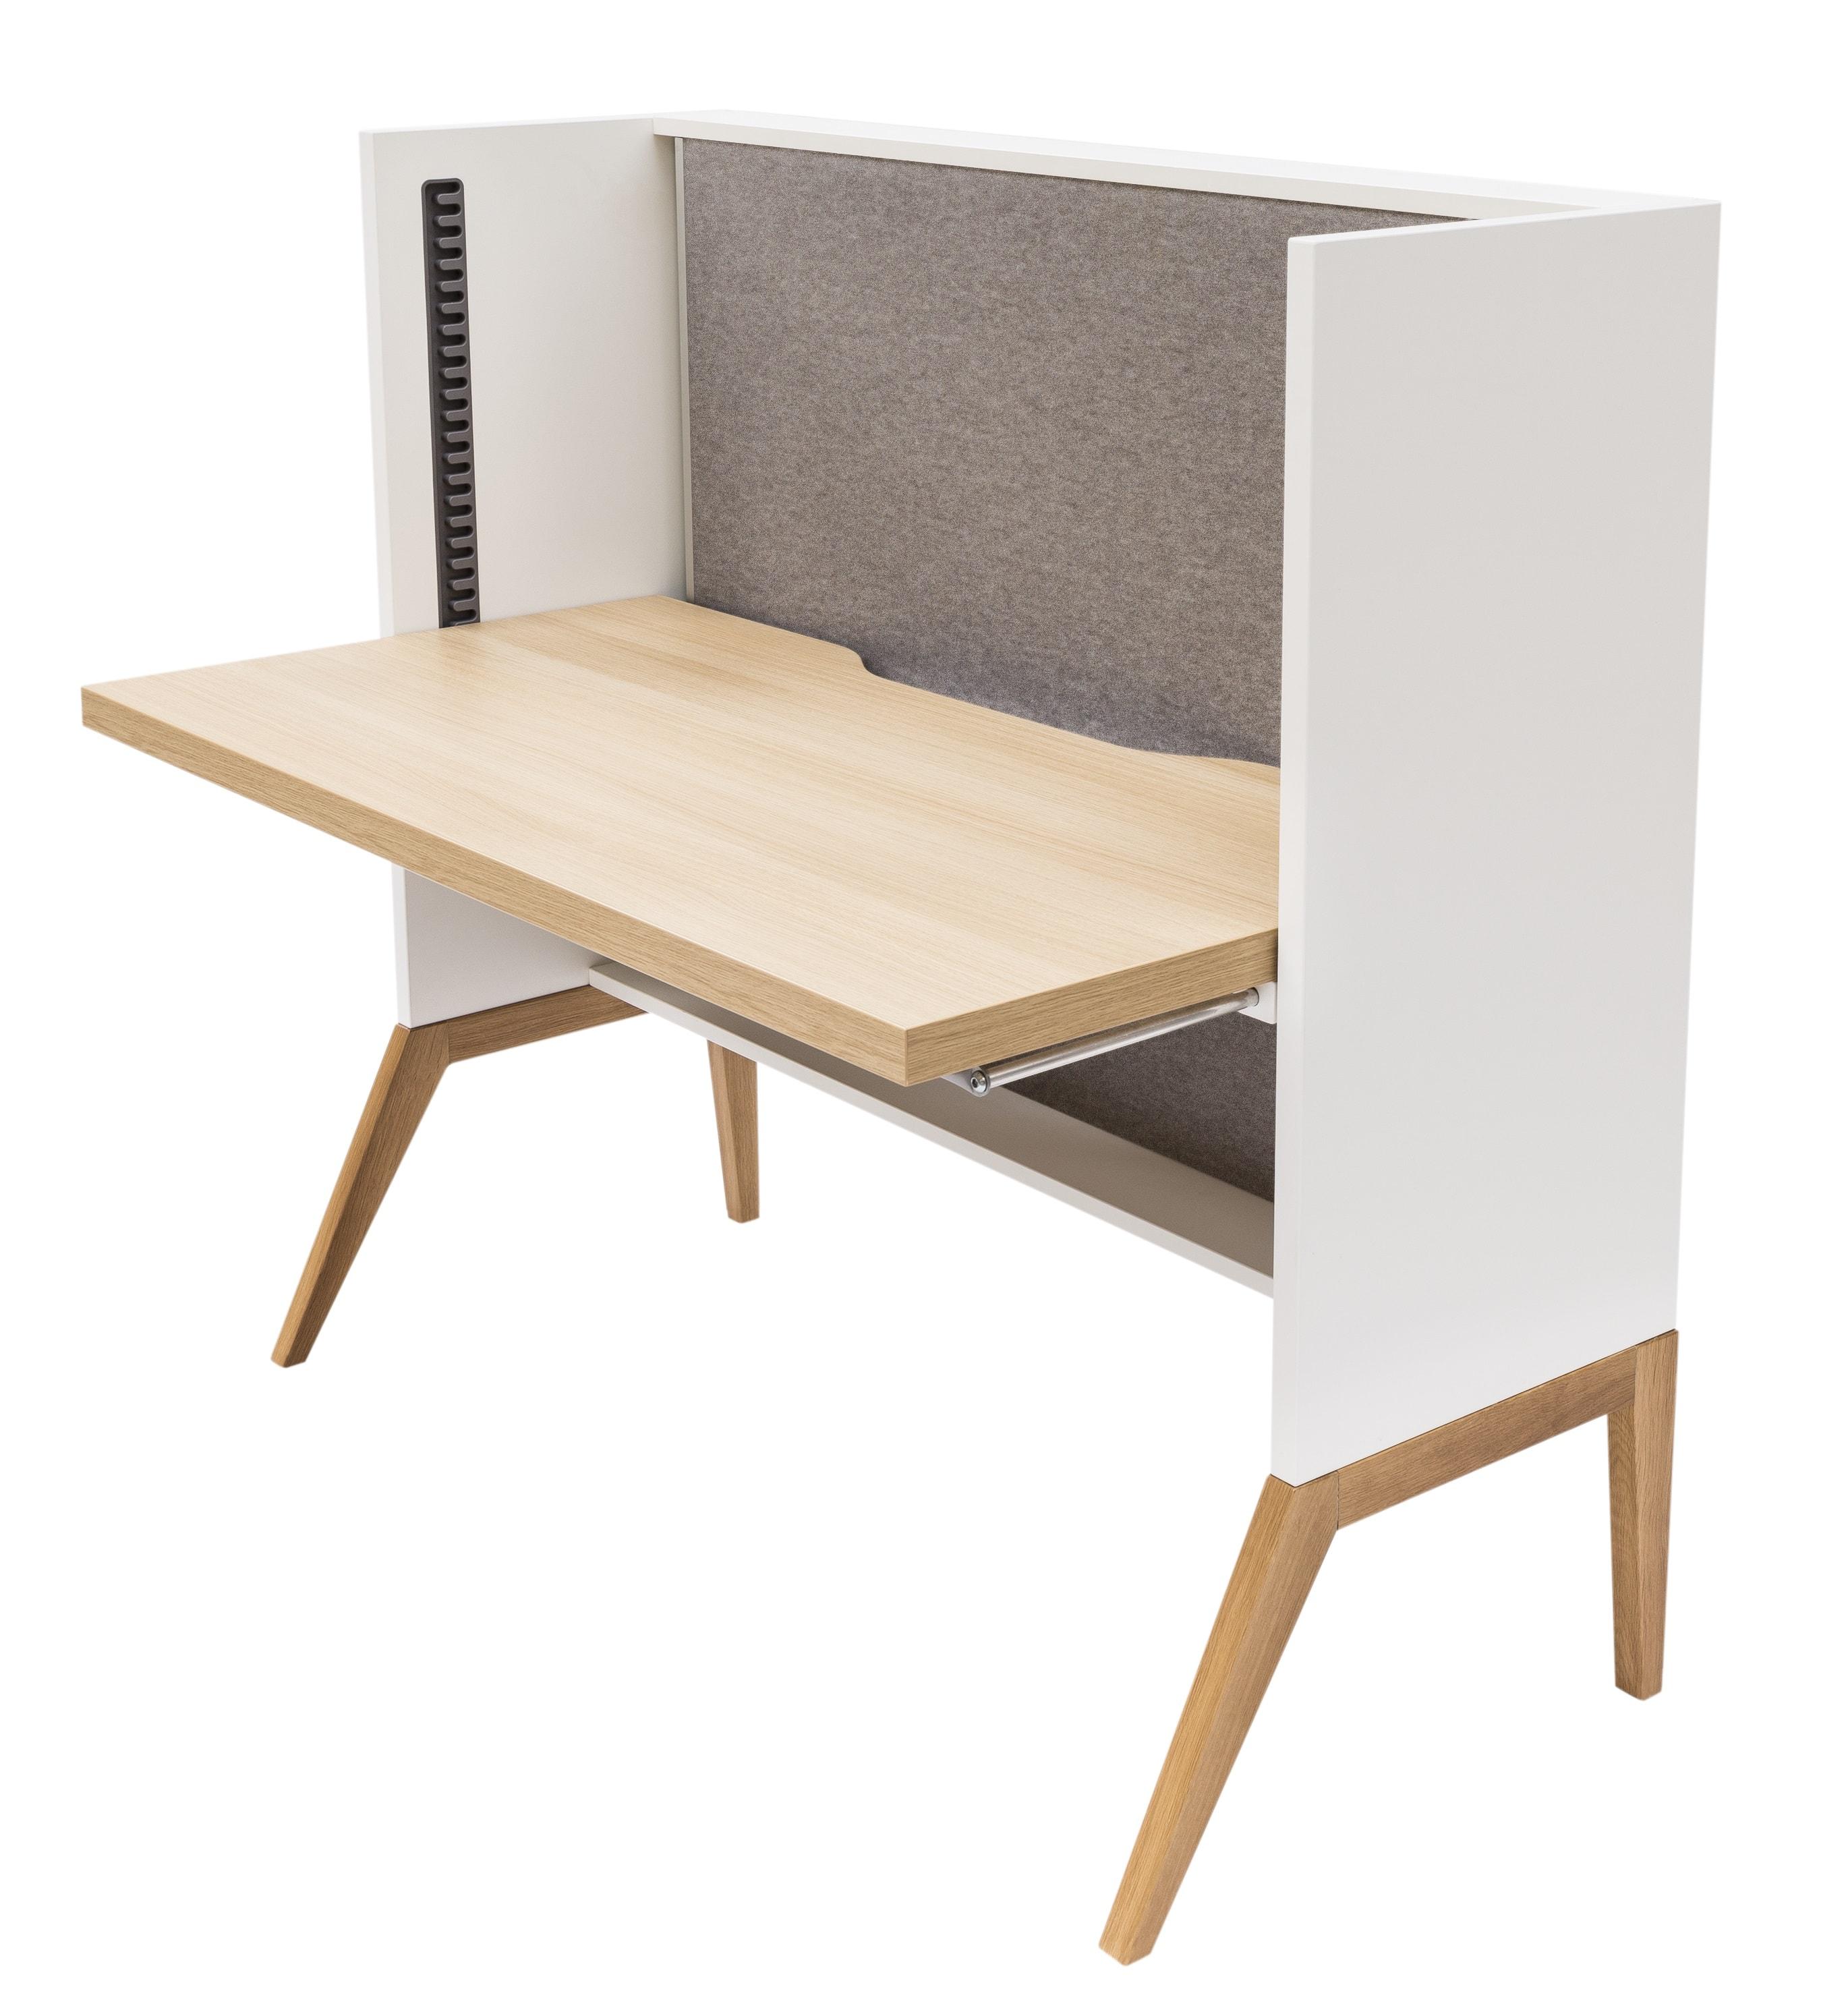 Mikomax-Nest-zit-sta-bureau-15